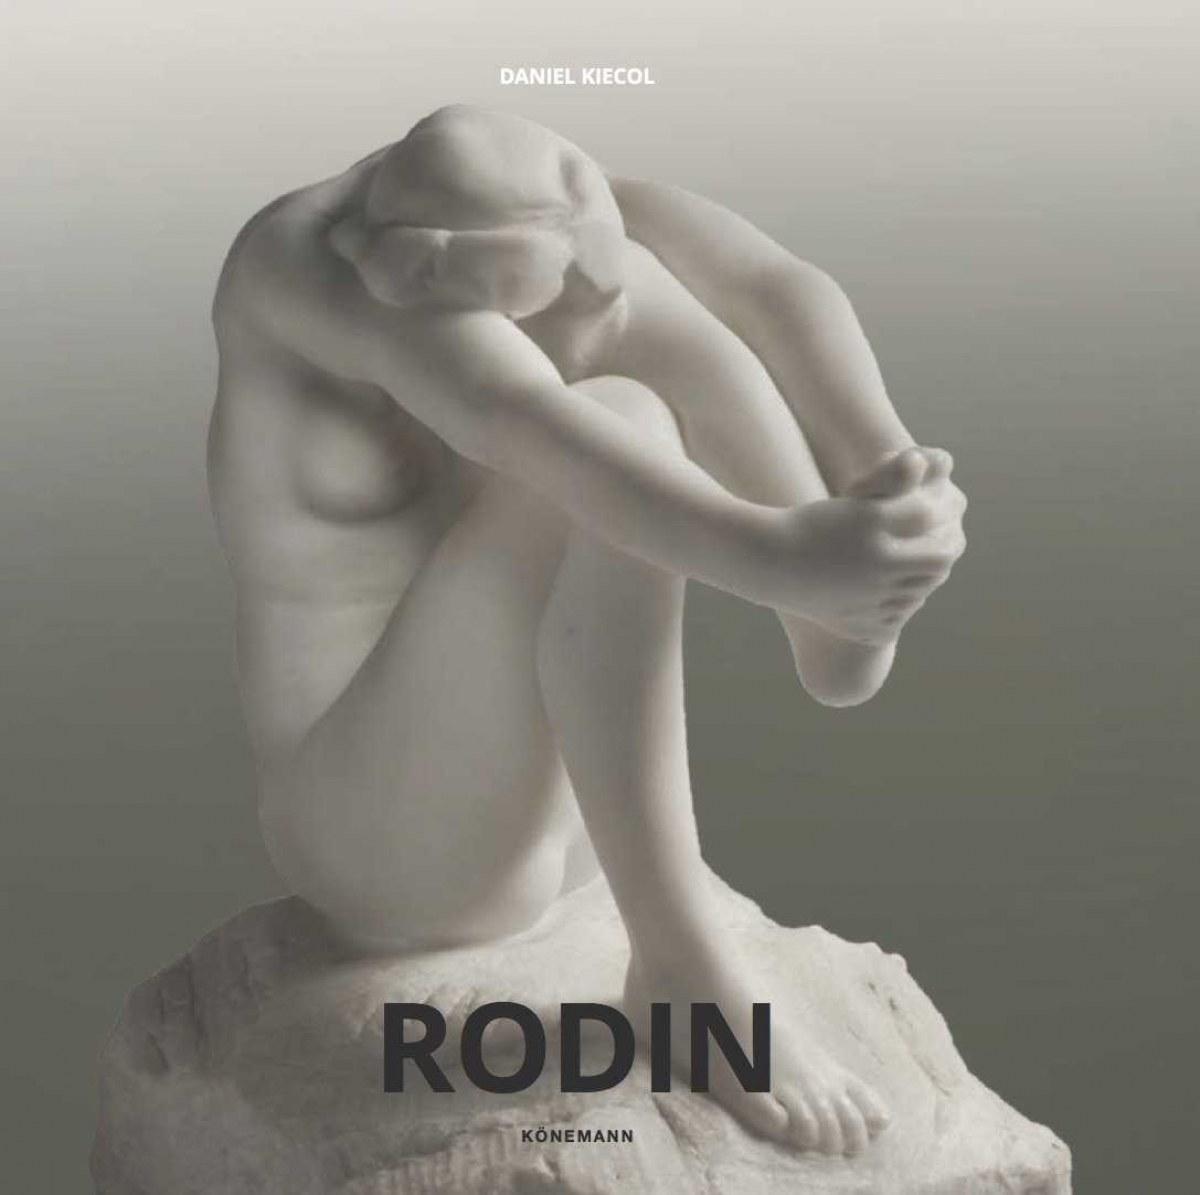 RODIN 9783955886639